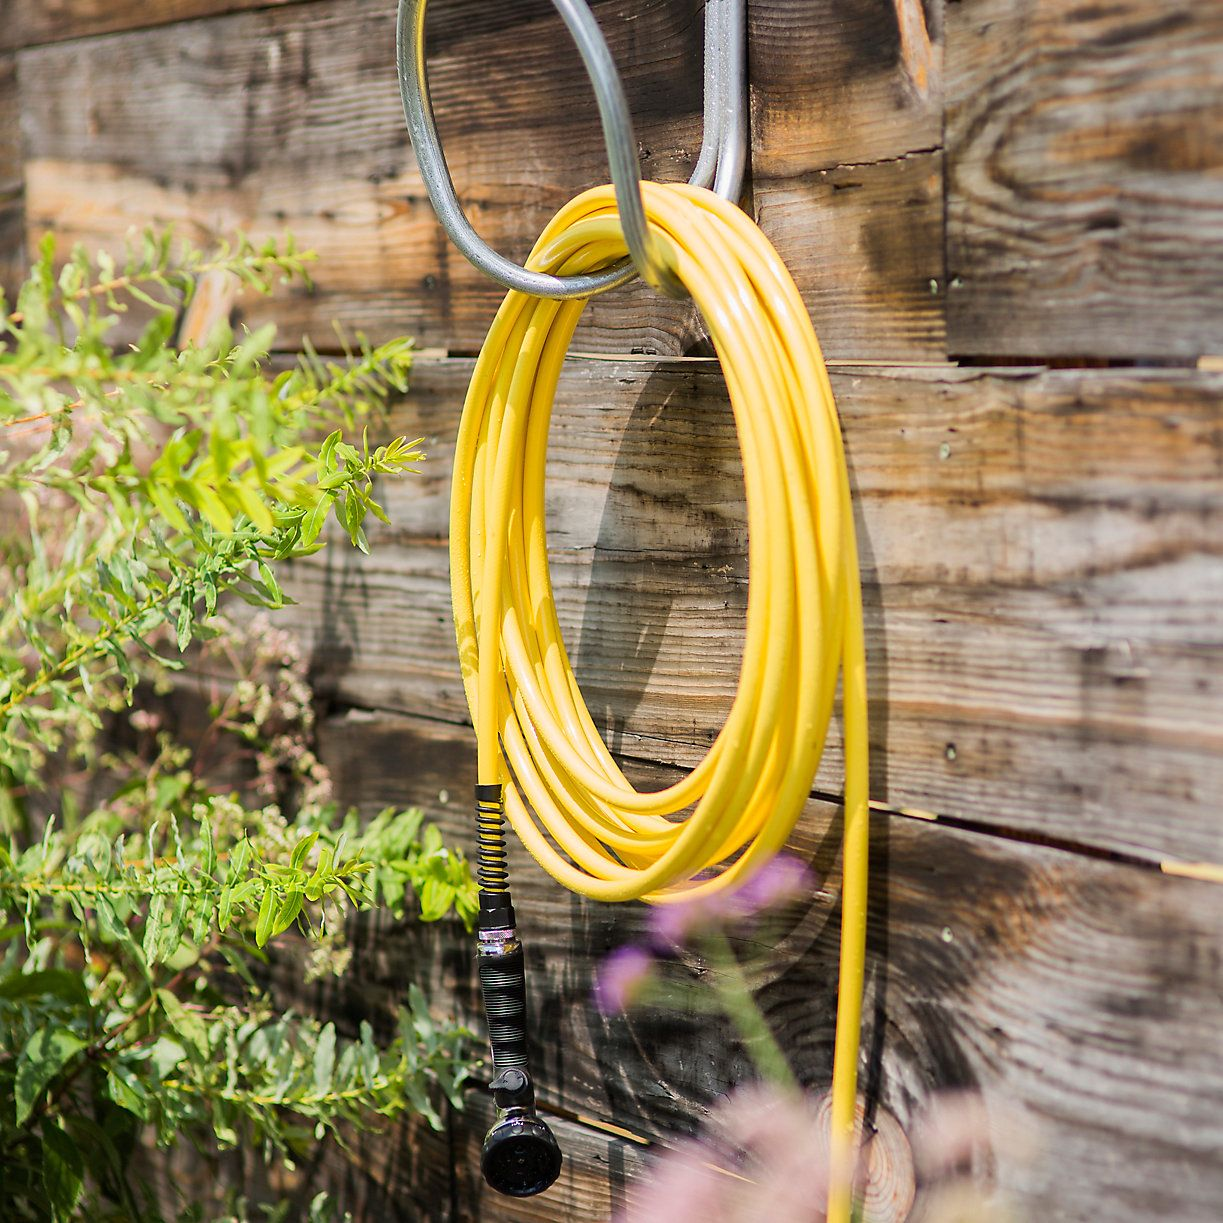 Heritage Garden Hose | Garden hose and Gardens